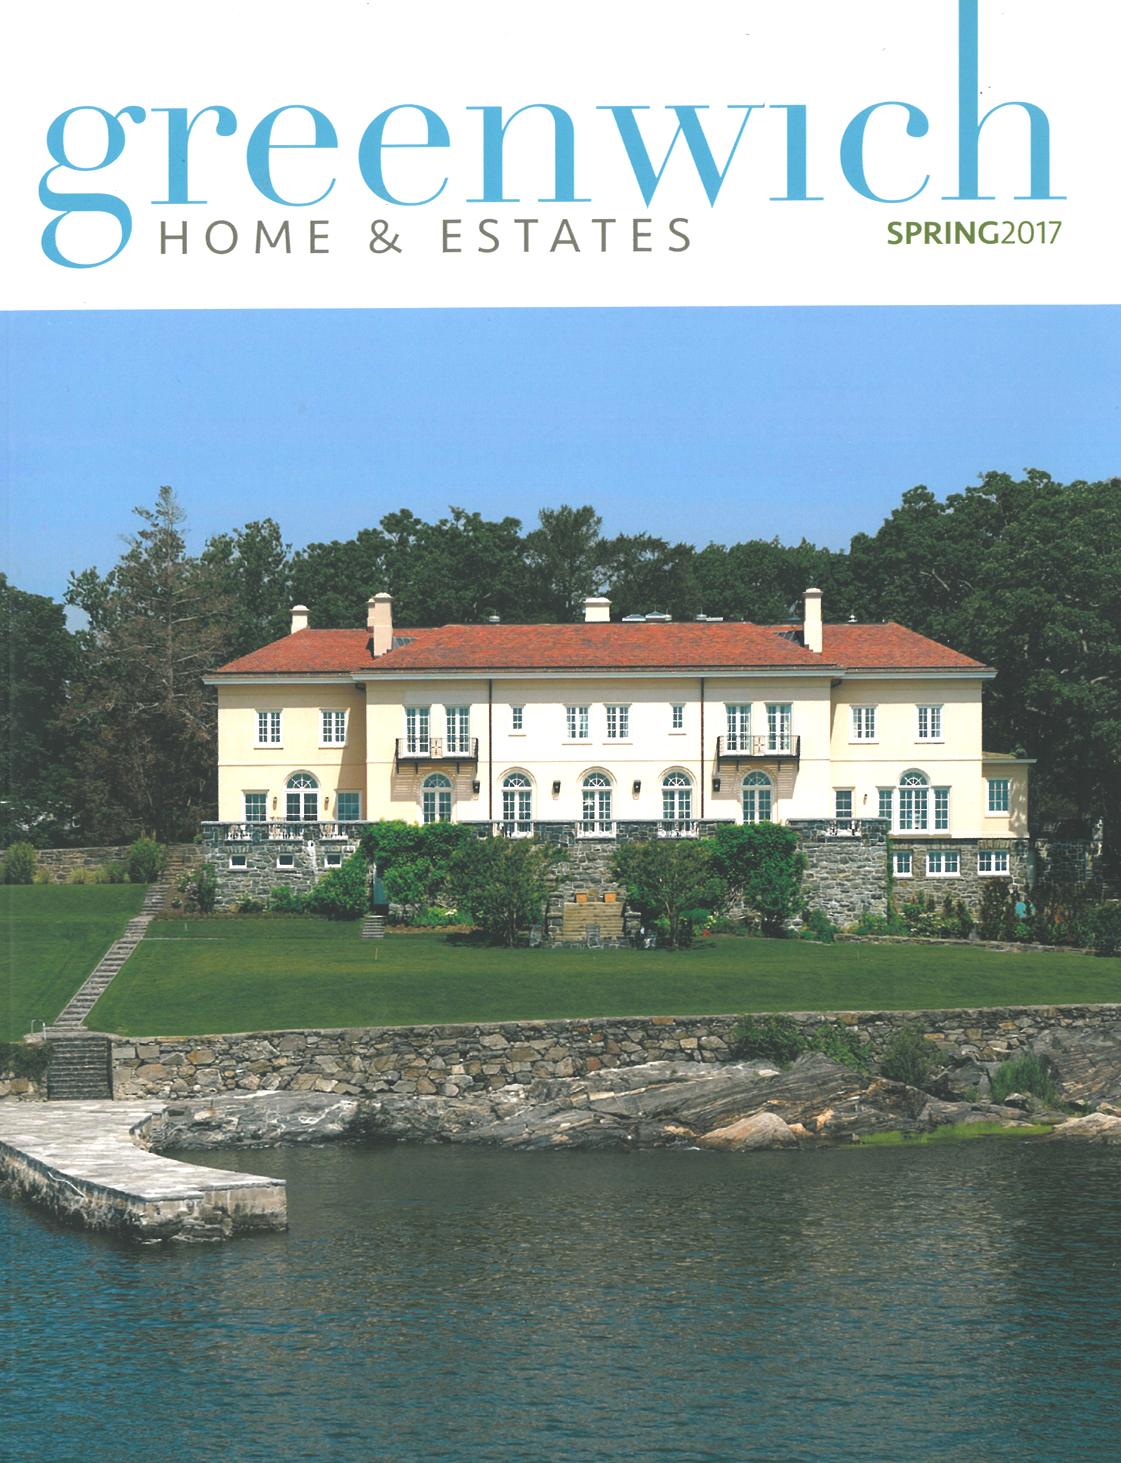 Greenwich-Home-Estates-Spring-2017